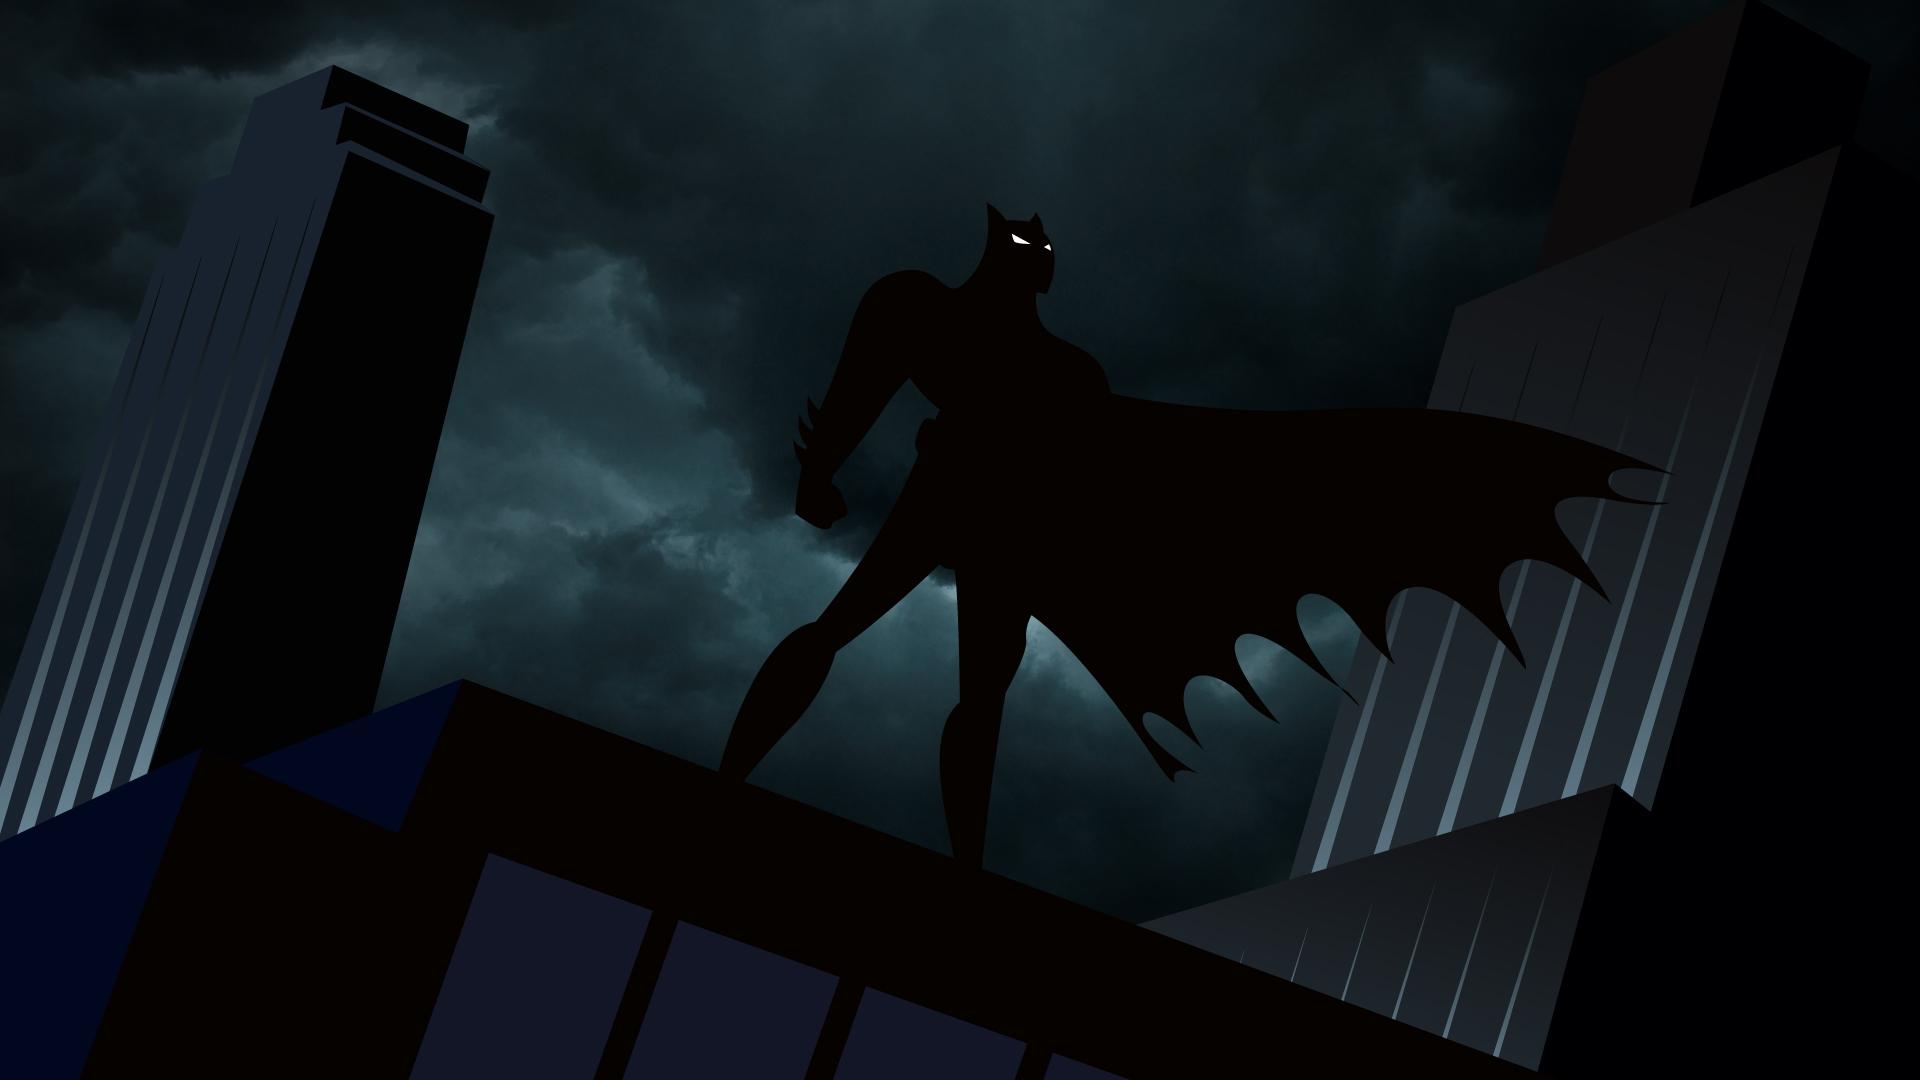 Batman wallpaper hd 1920x1080 wallpapersafari batman logo wallpaper hd 1920x1080 batman widescreen wallpaper 1920x1080 voltagebd Image collections